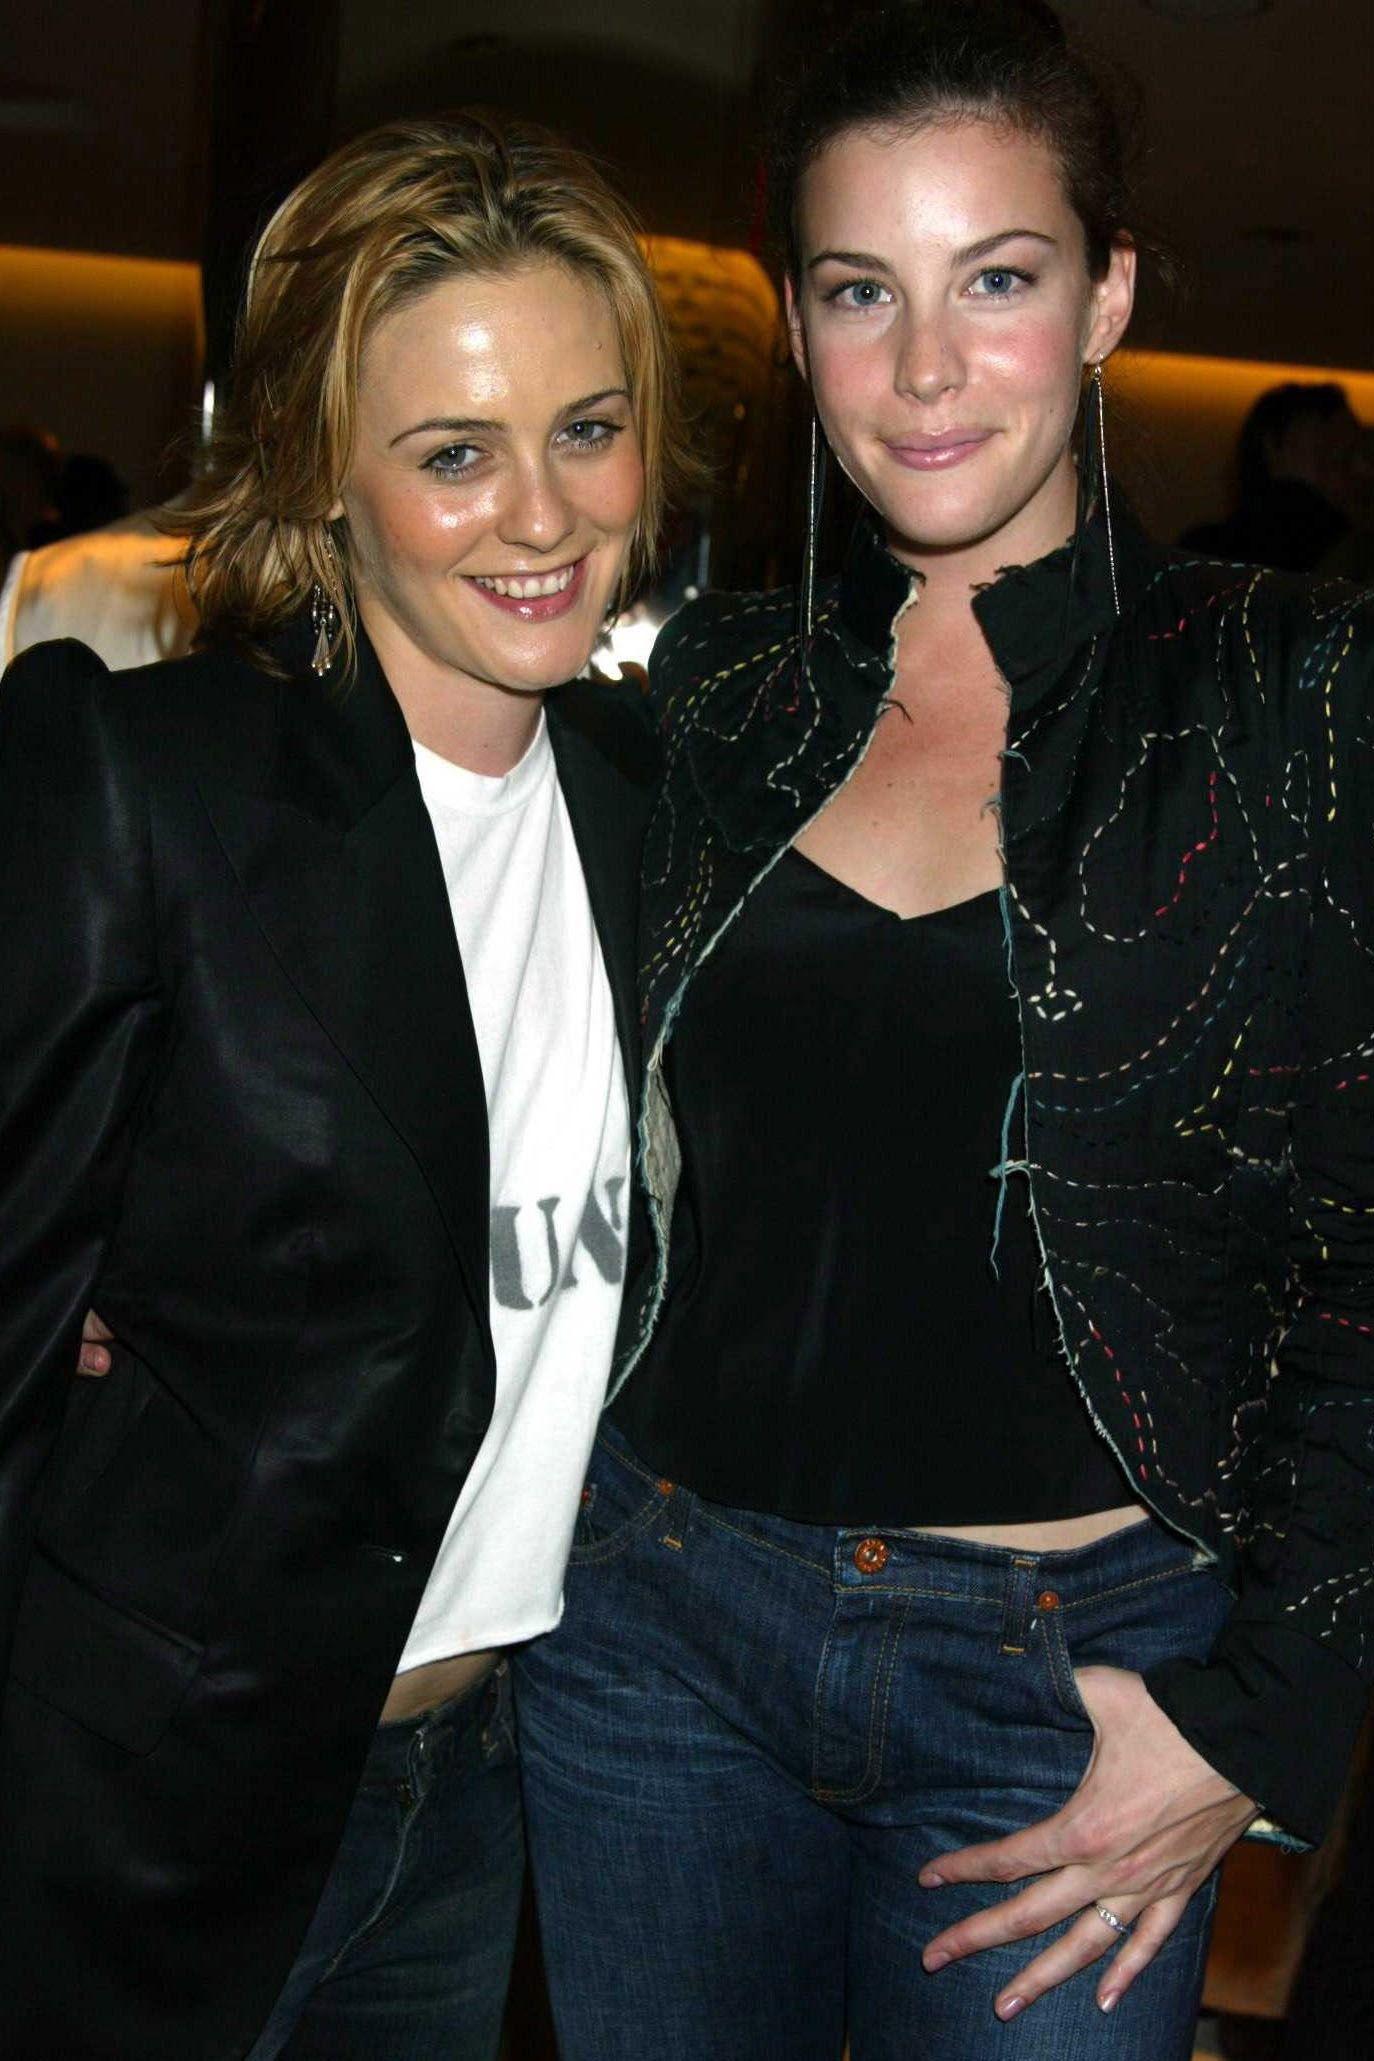 Drew Barrymore & Alicia Silverstone 1998 Nickelodeon Kid s Choice